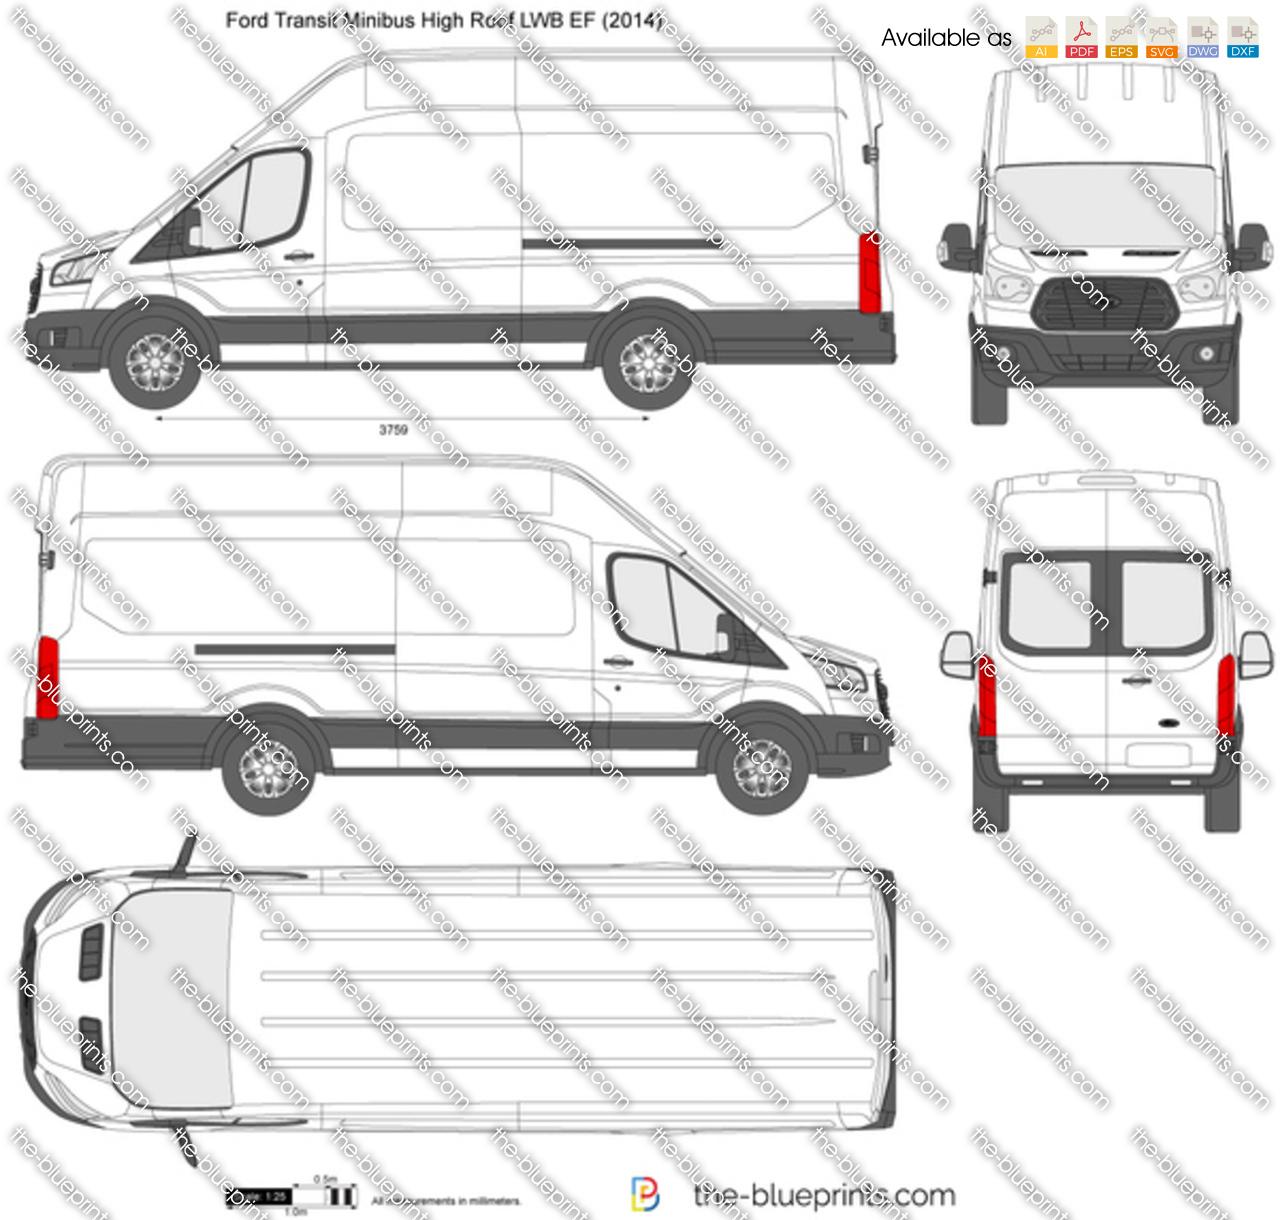 Ford Transit Minibus High Roof LWB EF